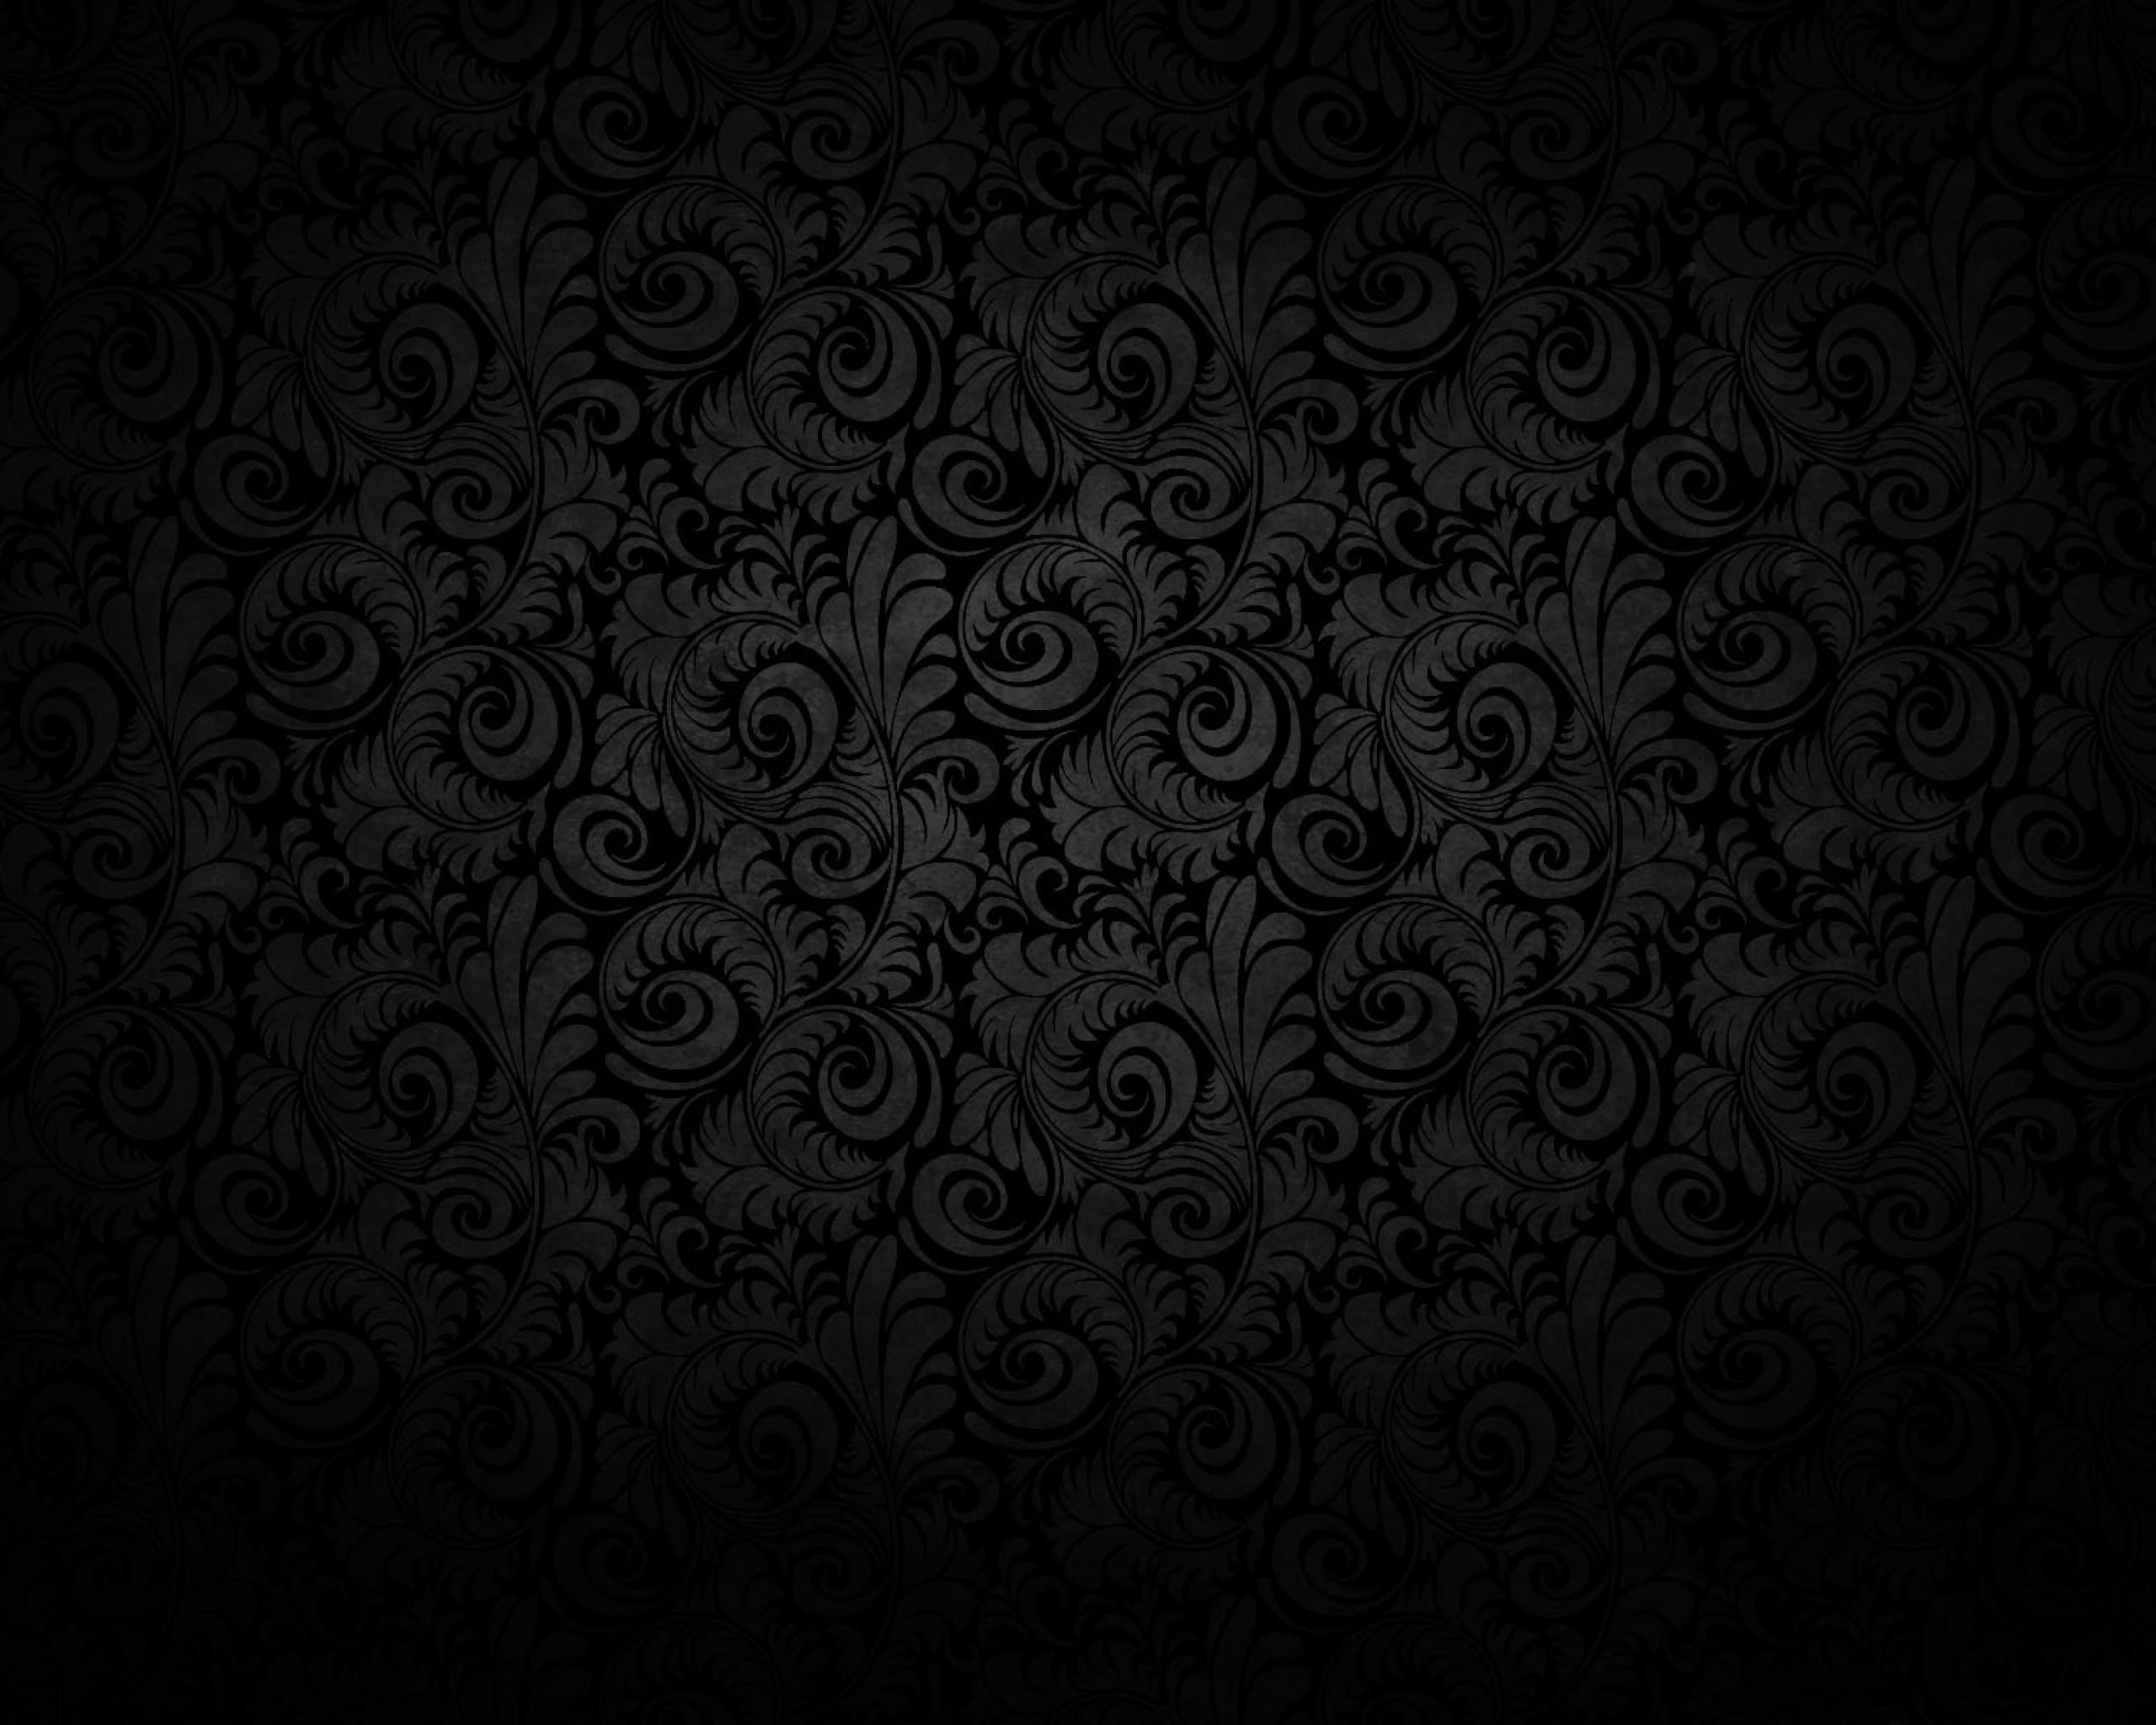 Black · Black Art wallpapers desktop background